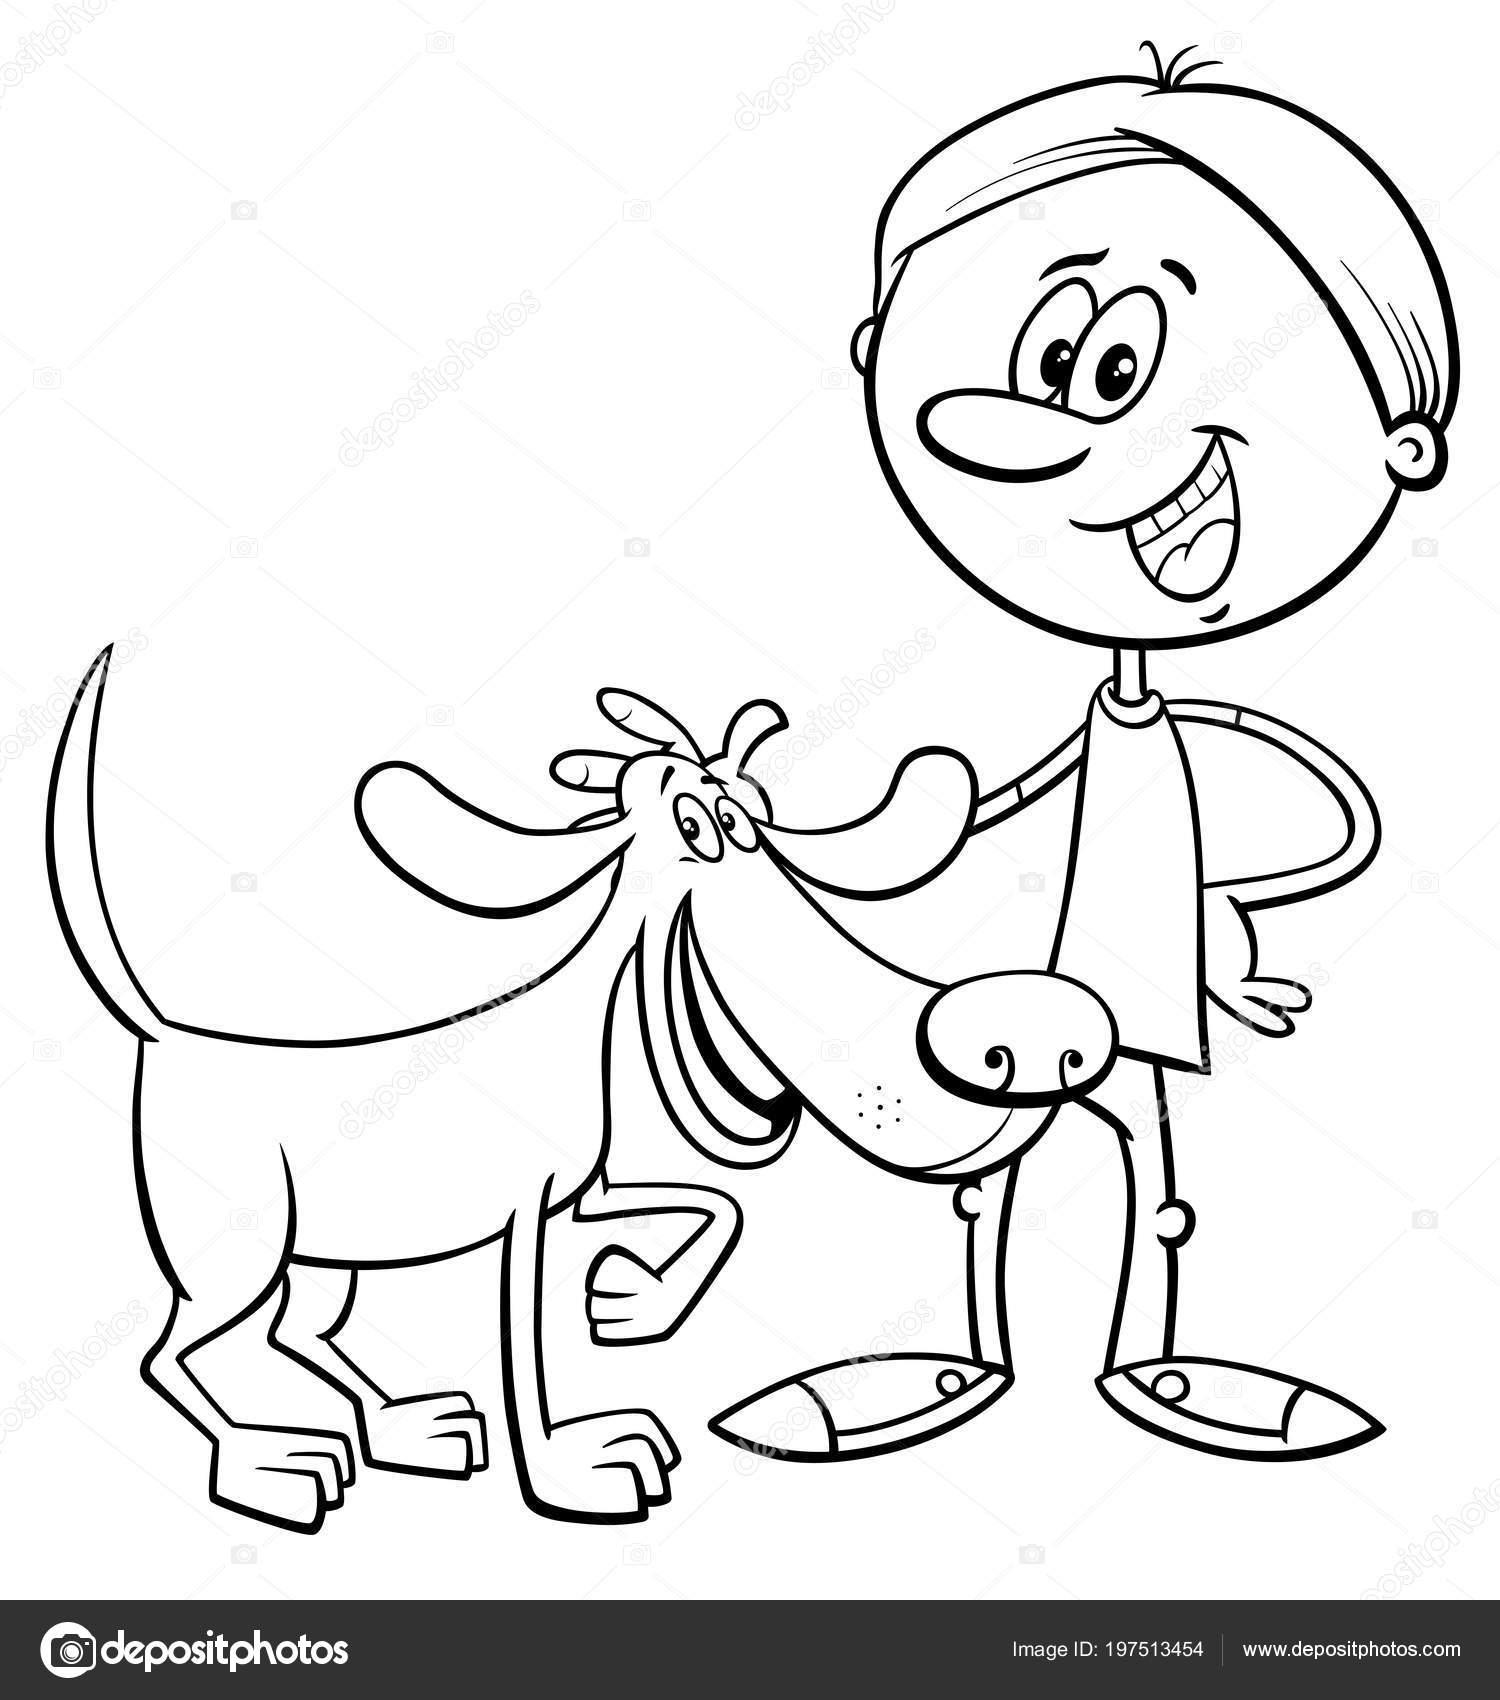 Black White Cartoon Illustration Boy Funny Dog Puppy Coloring Book ...